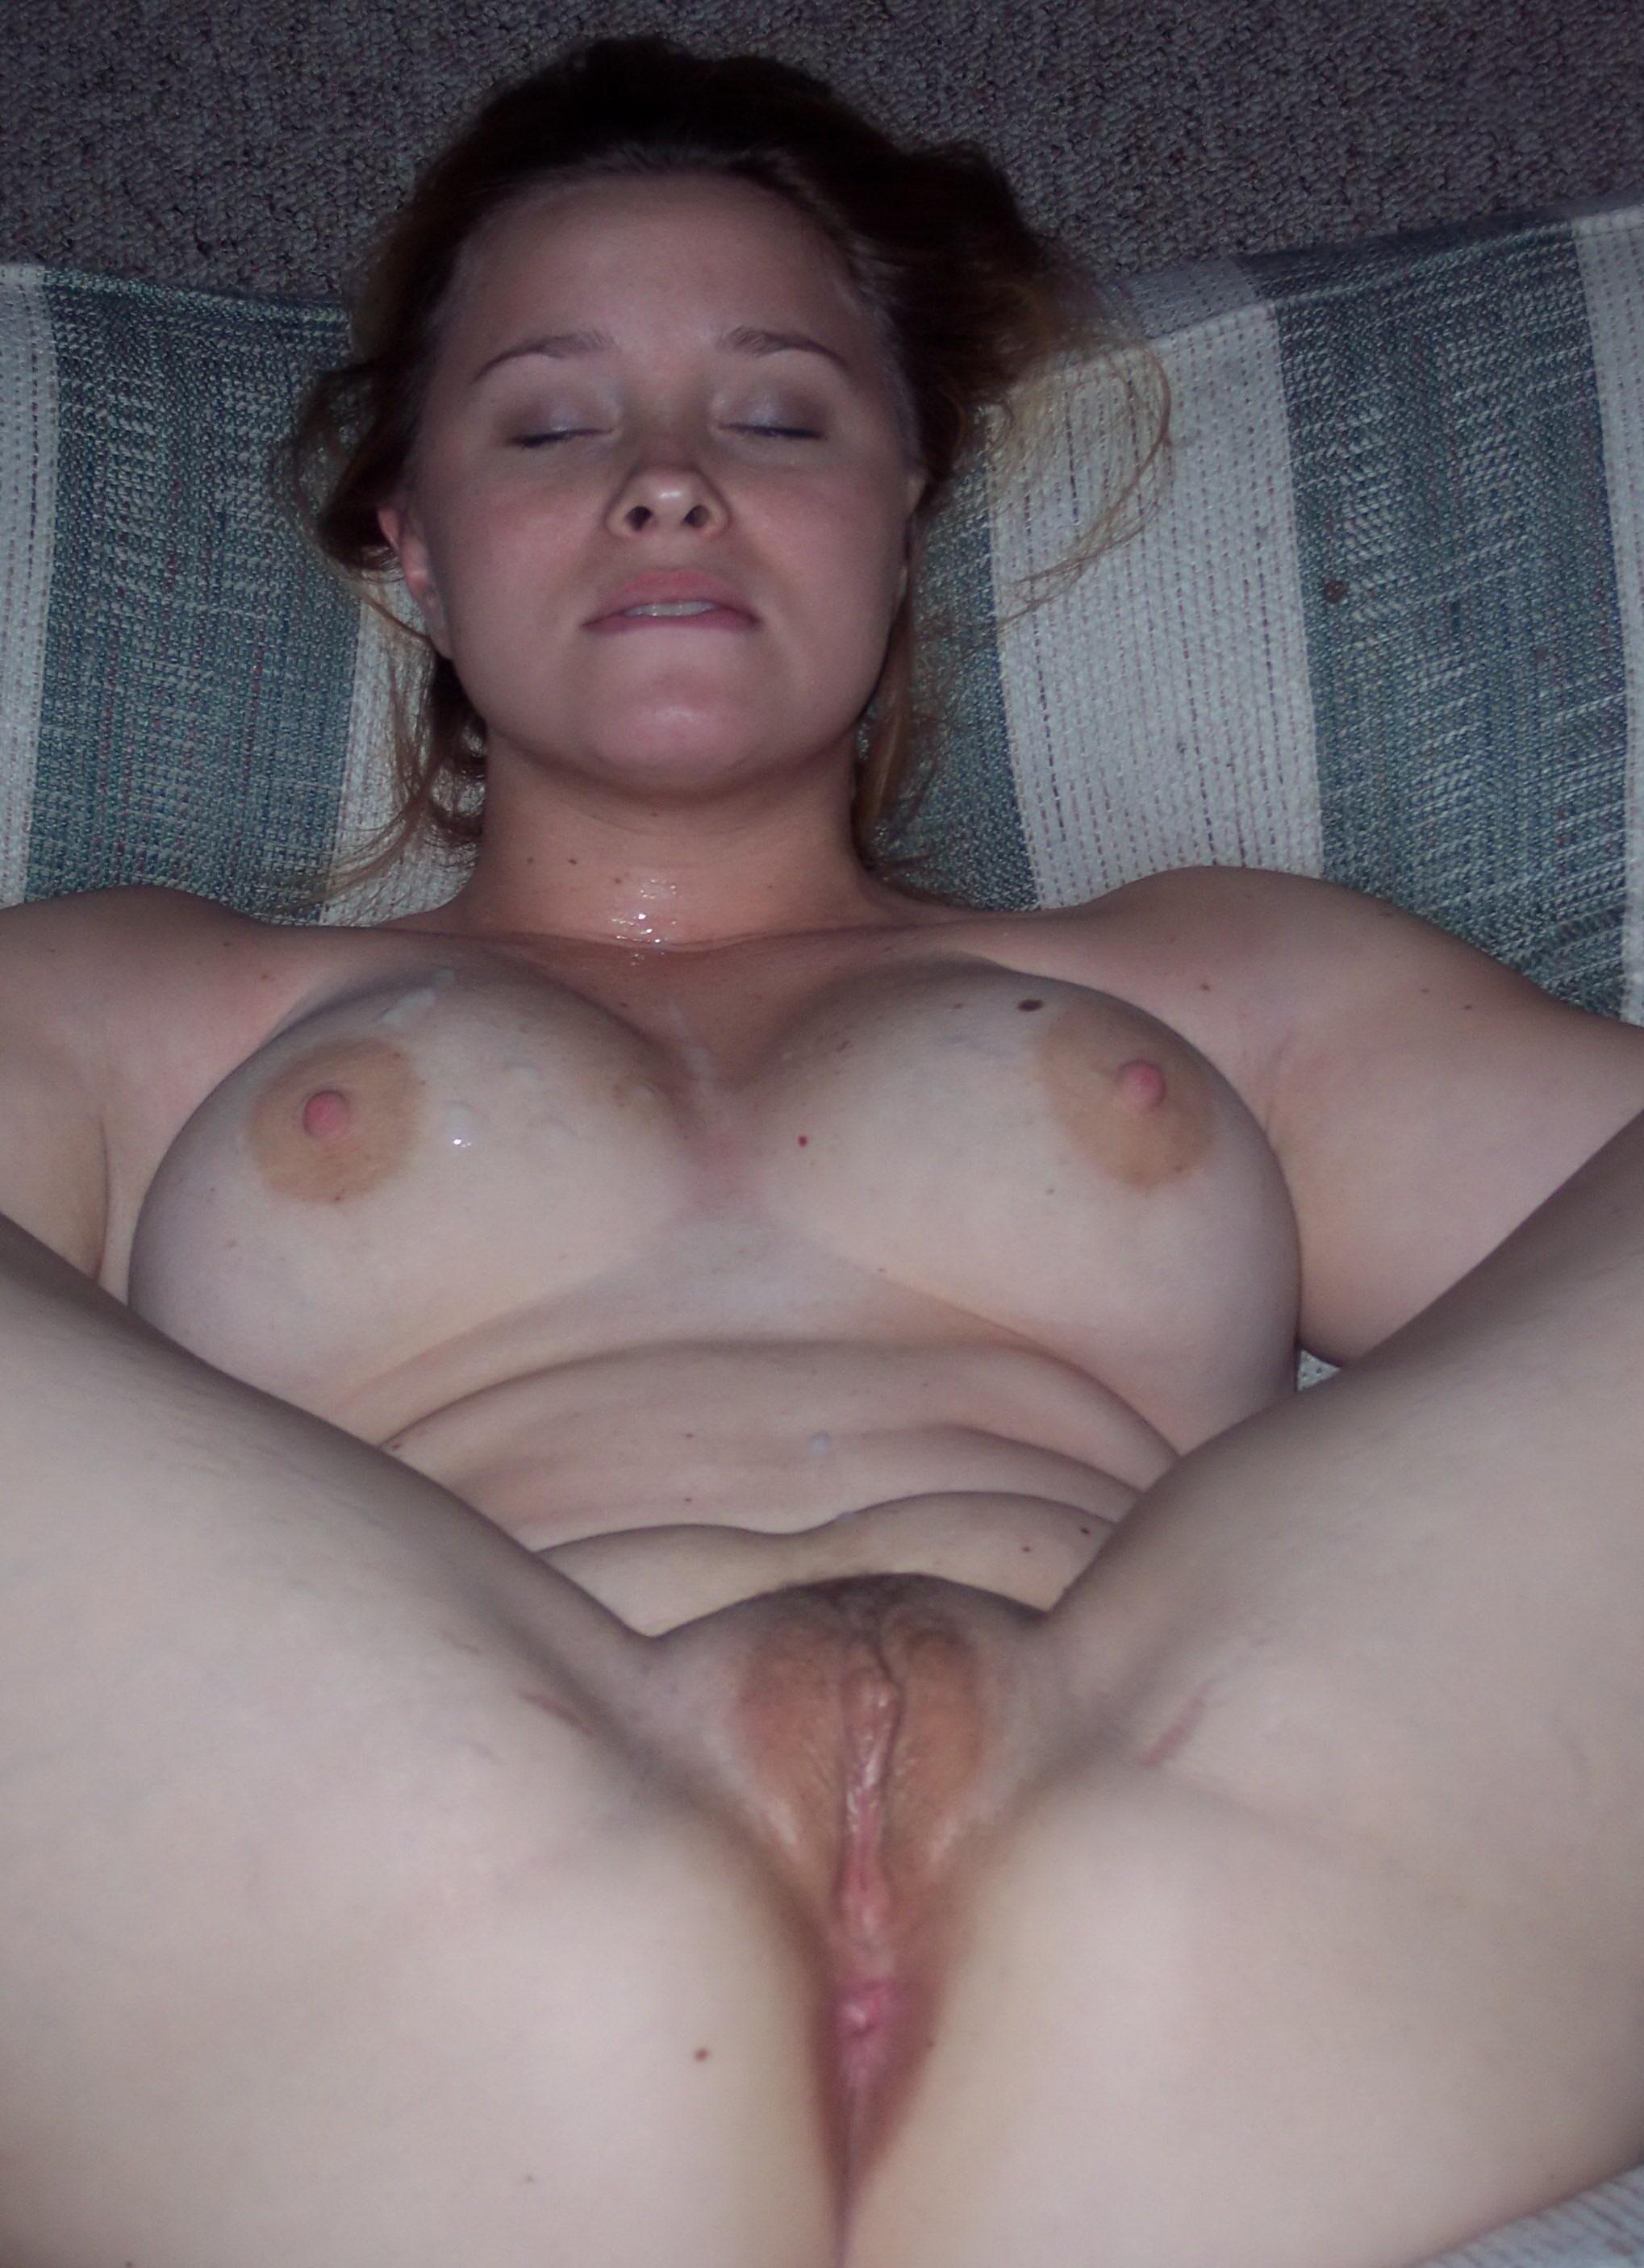 Chubby Teens Nude « beqizu12